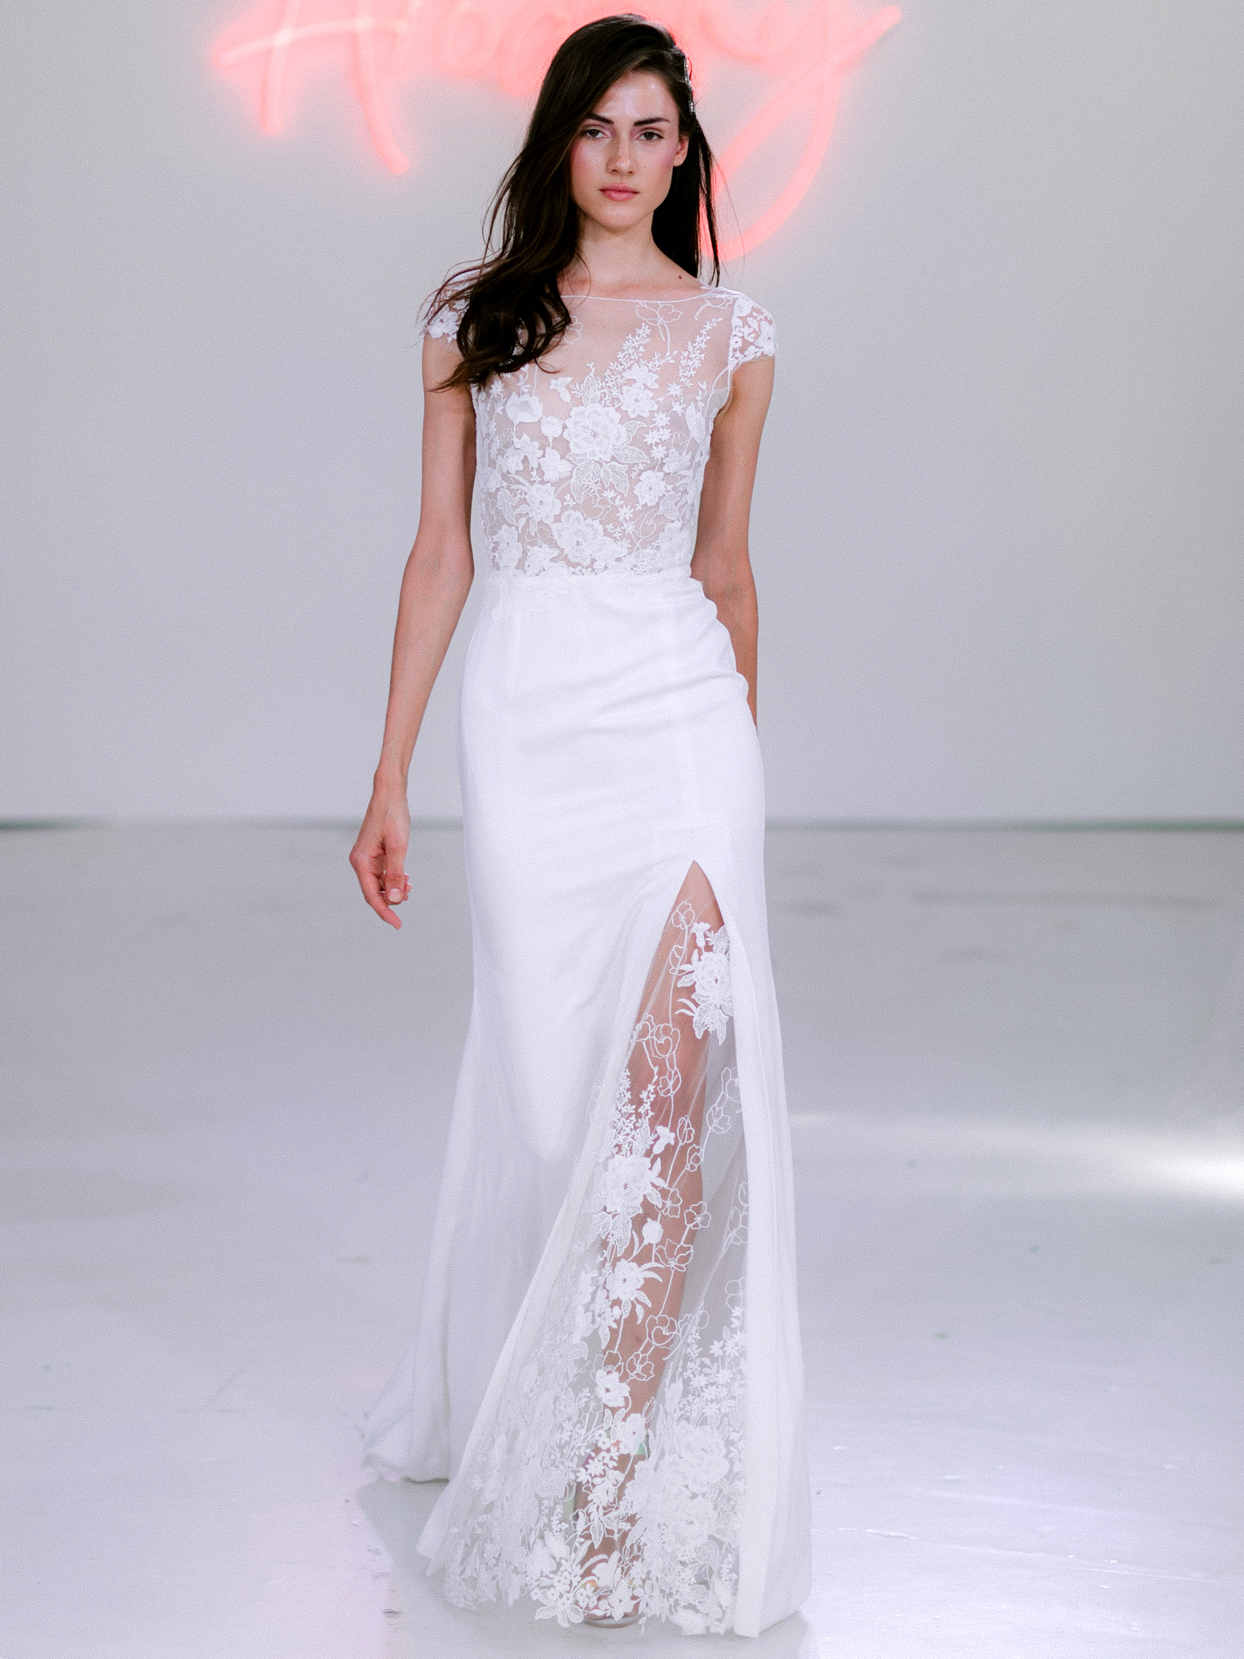 Rime Arodaky X The Mews Bridal sheer lace illusion crew neck cap sleeve wedding dress fall 2020